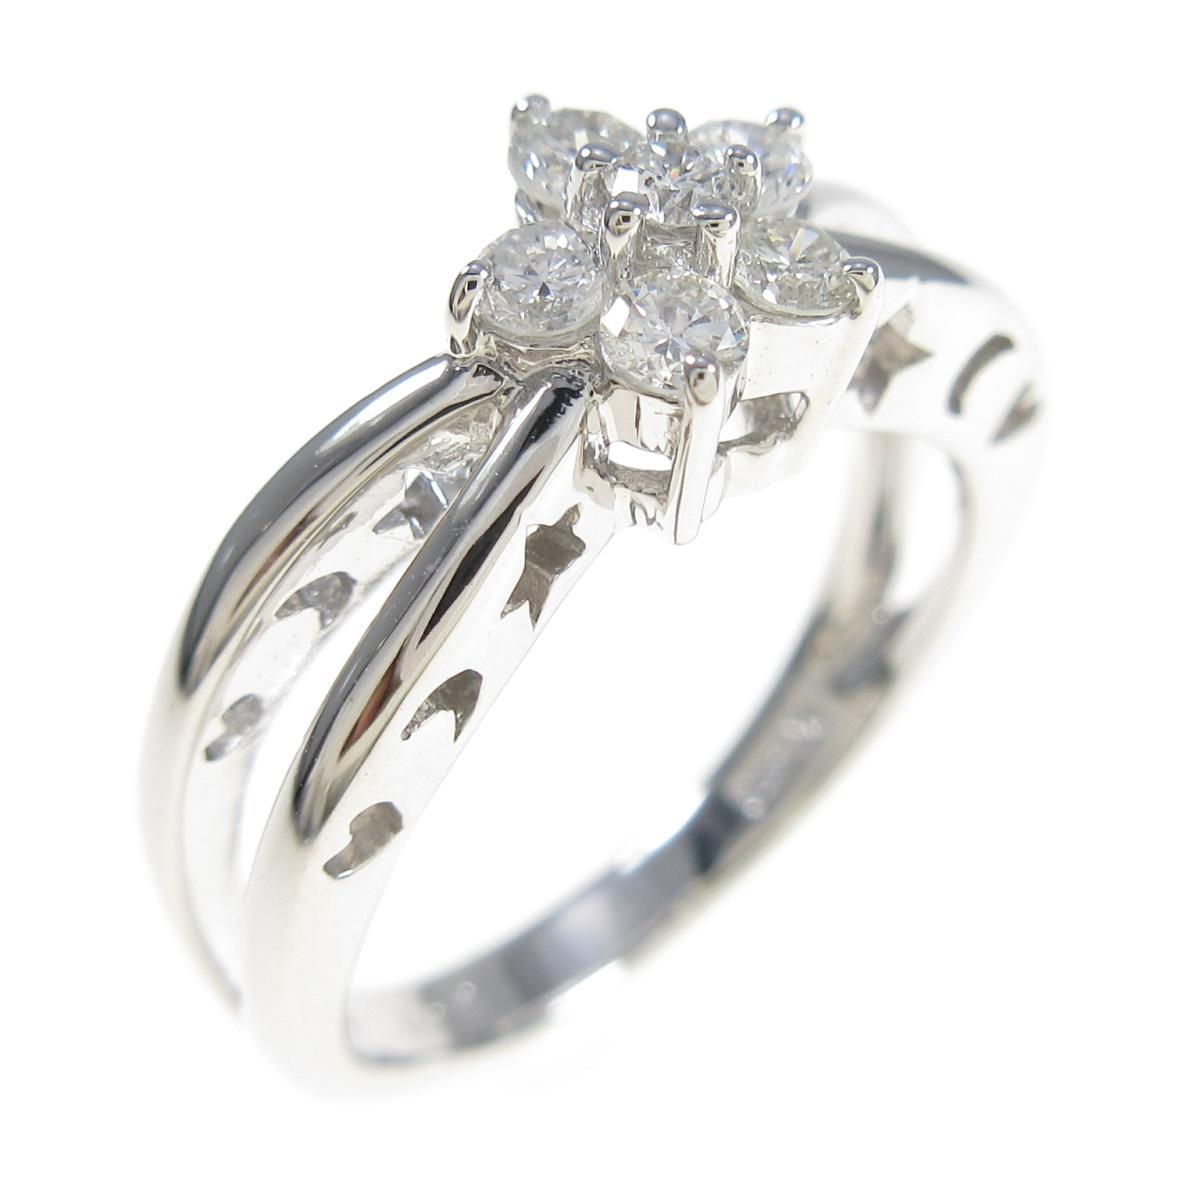 K18WG フラワー 超定番 中古 流行のアイテム ダイヤモンドリング